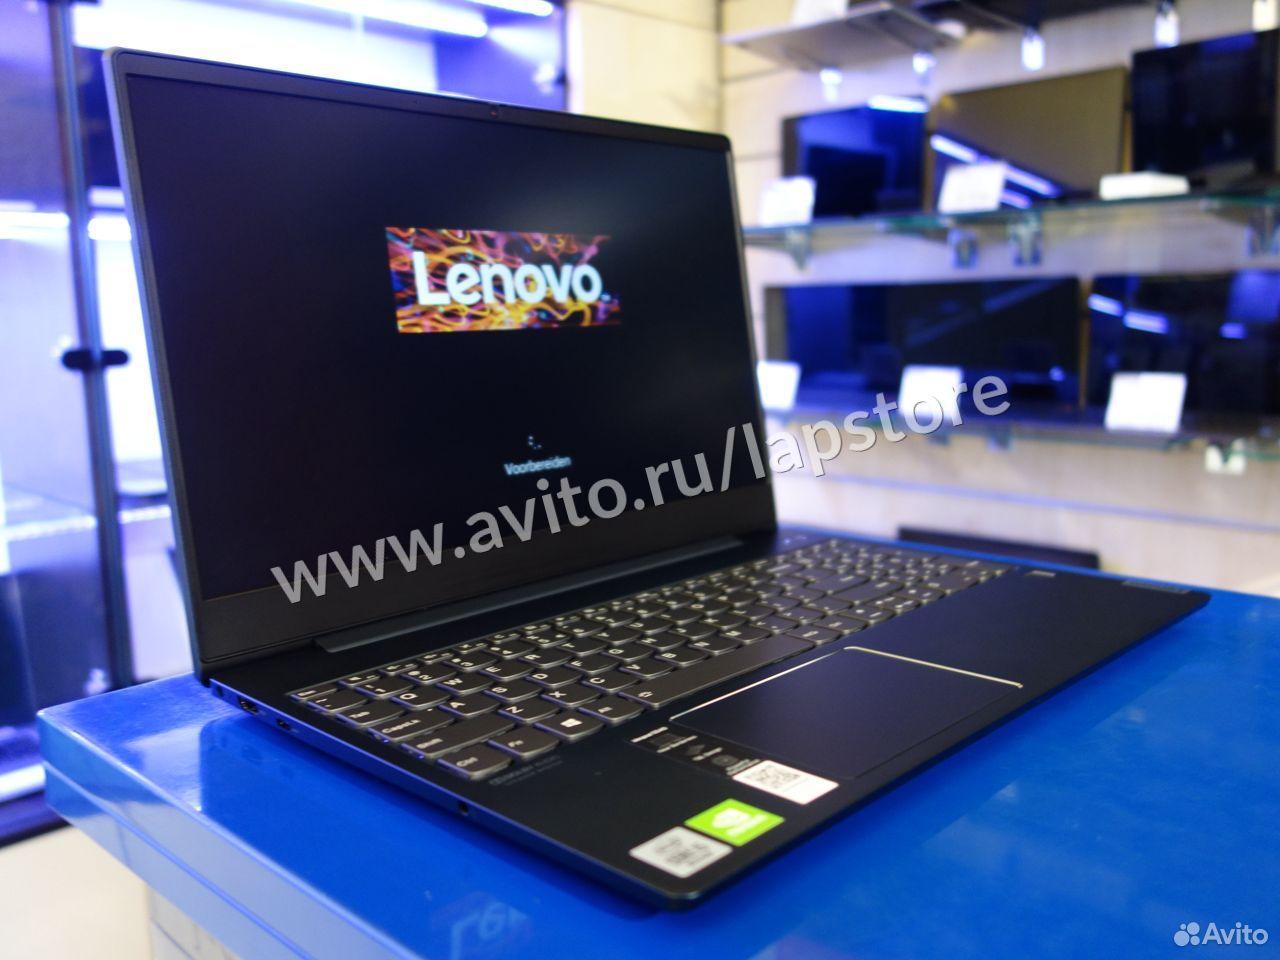 Ноутбук Lenovo S540 i5-10210/8G/512G SSD/MX250 2GB  84012422018 купить 1